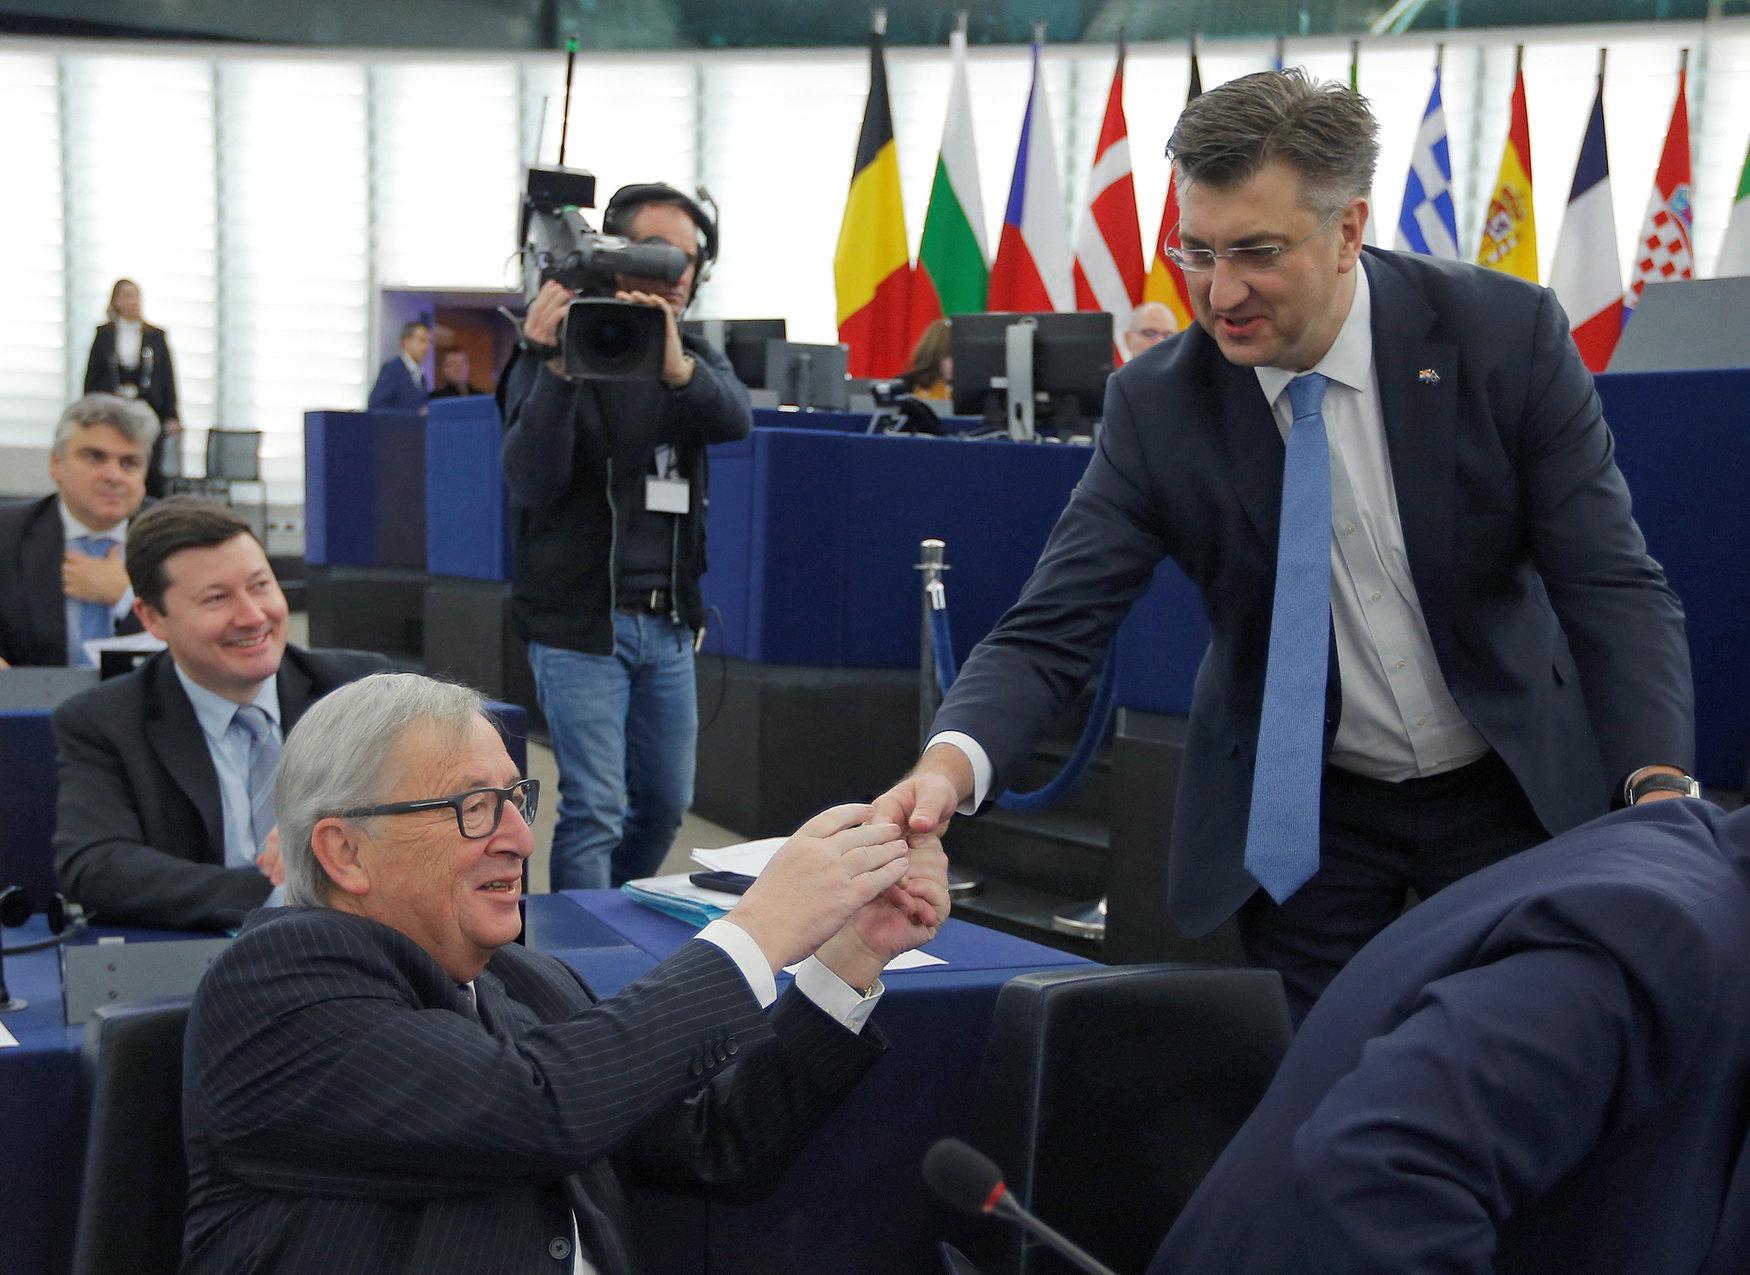 Andrej Plenković and Jean-Claude Juncker